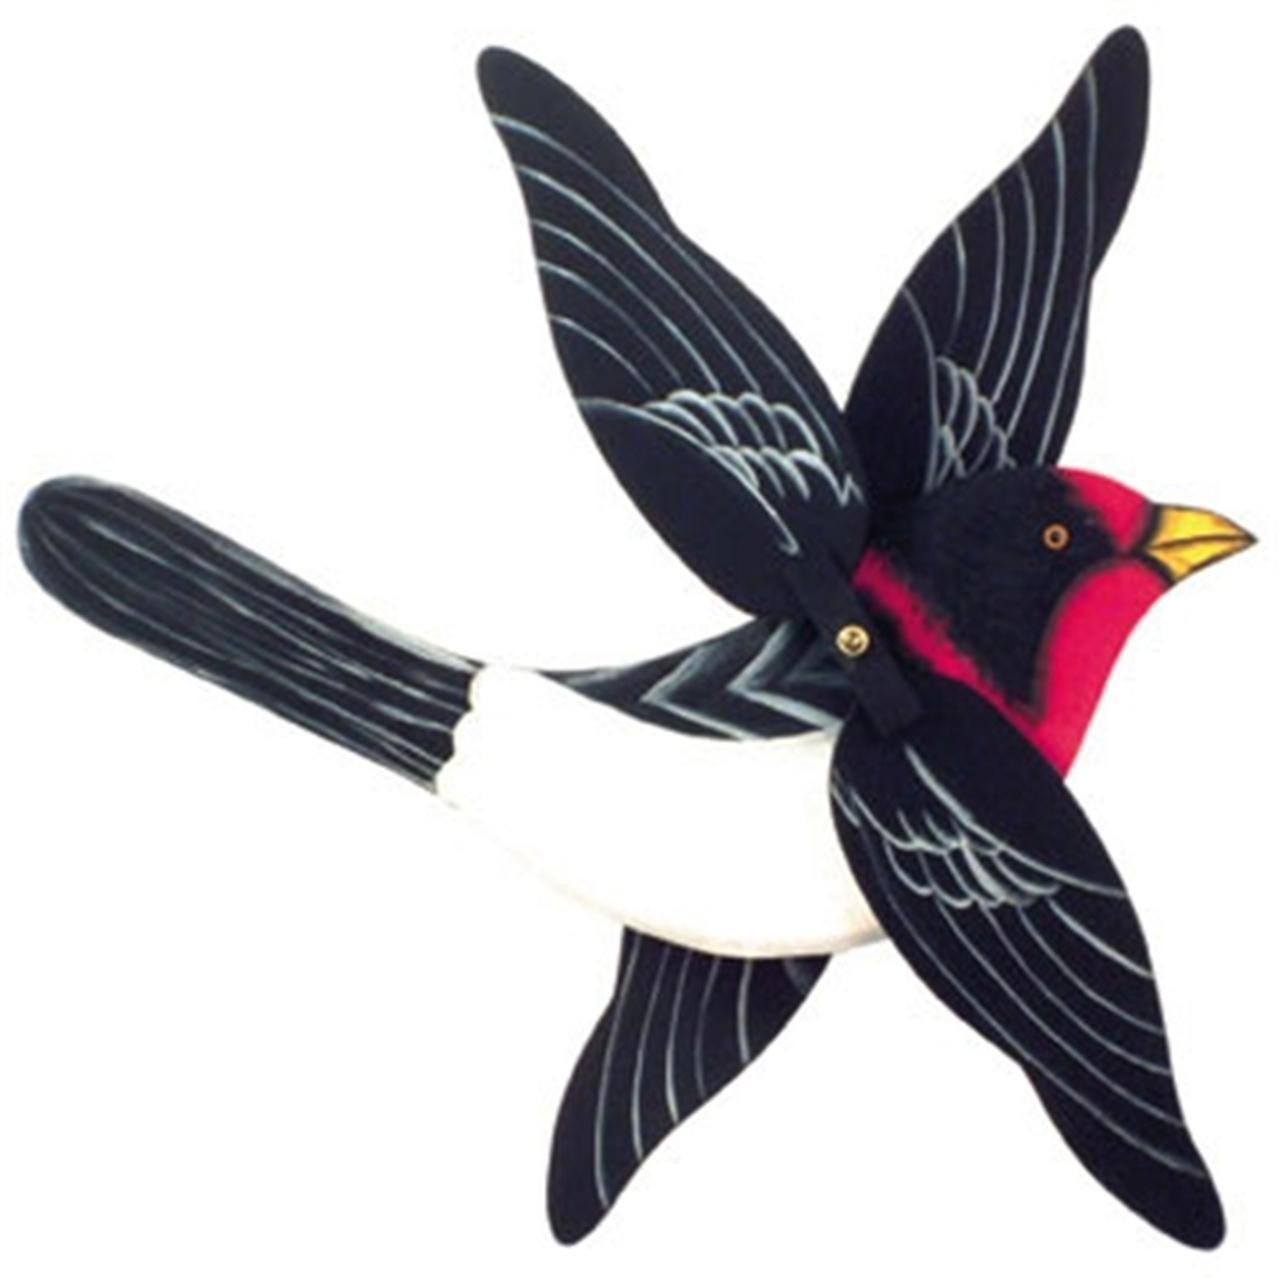 Cherry Tree Toys Red Breasted Warbler Whirligig DIY Kit